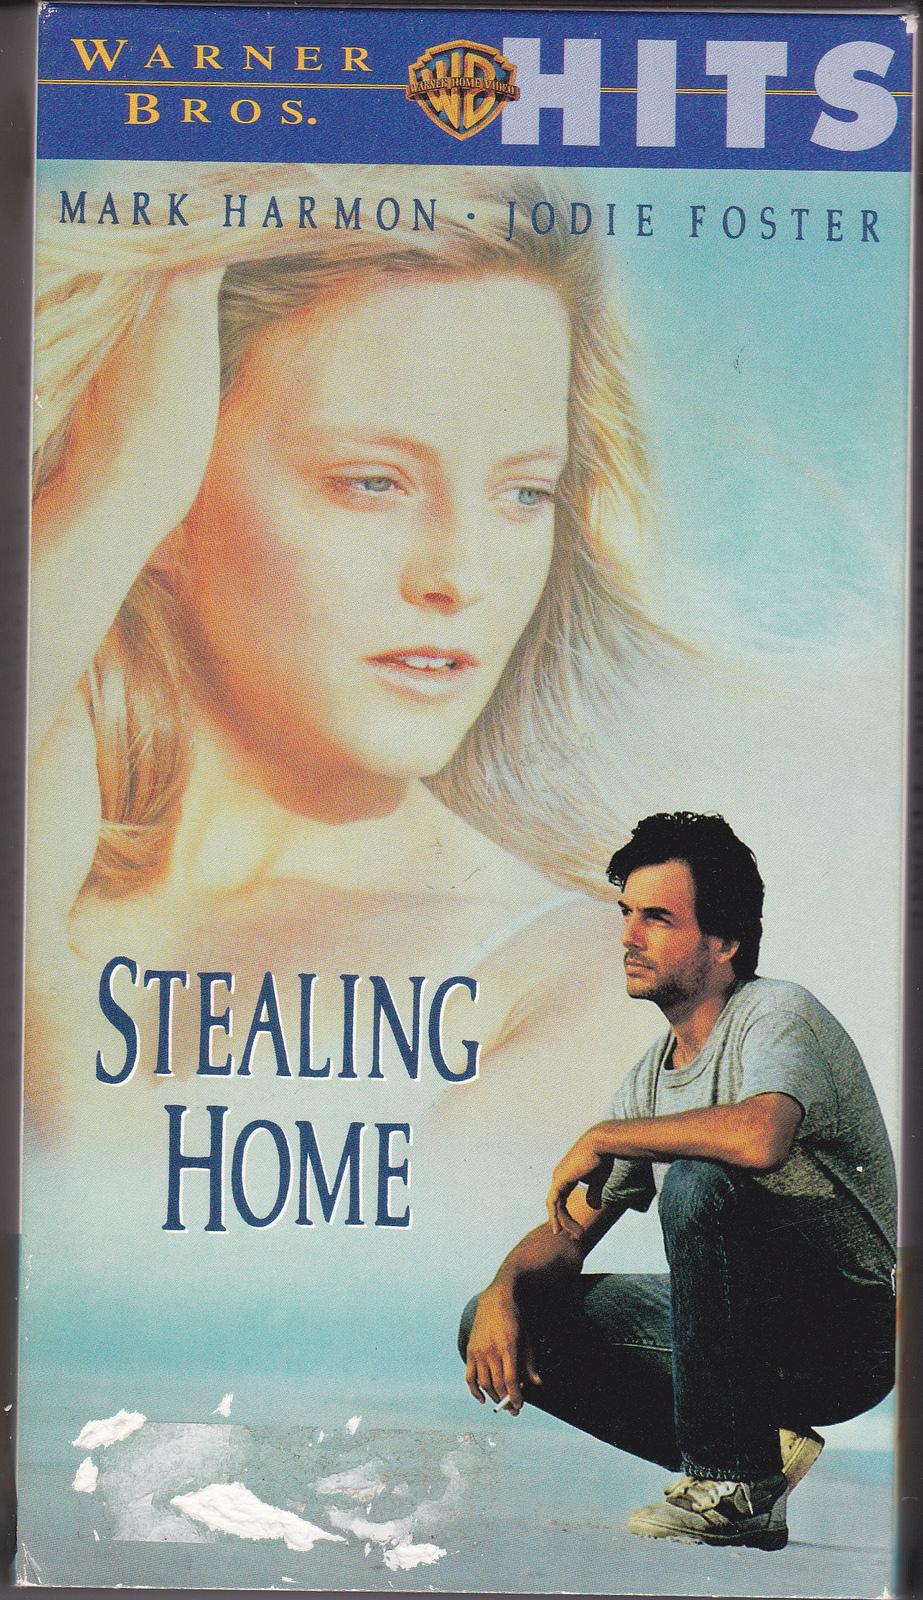 Stealing Home Warner Bros Vhs And 17 Similar Items